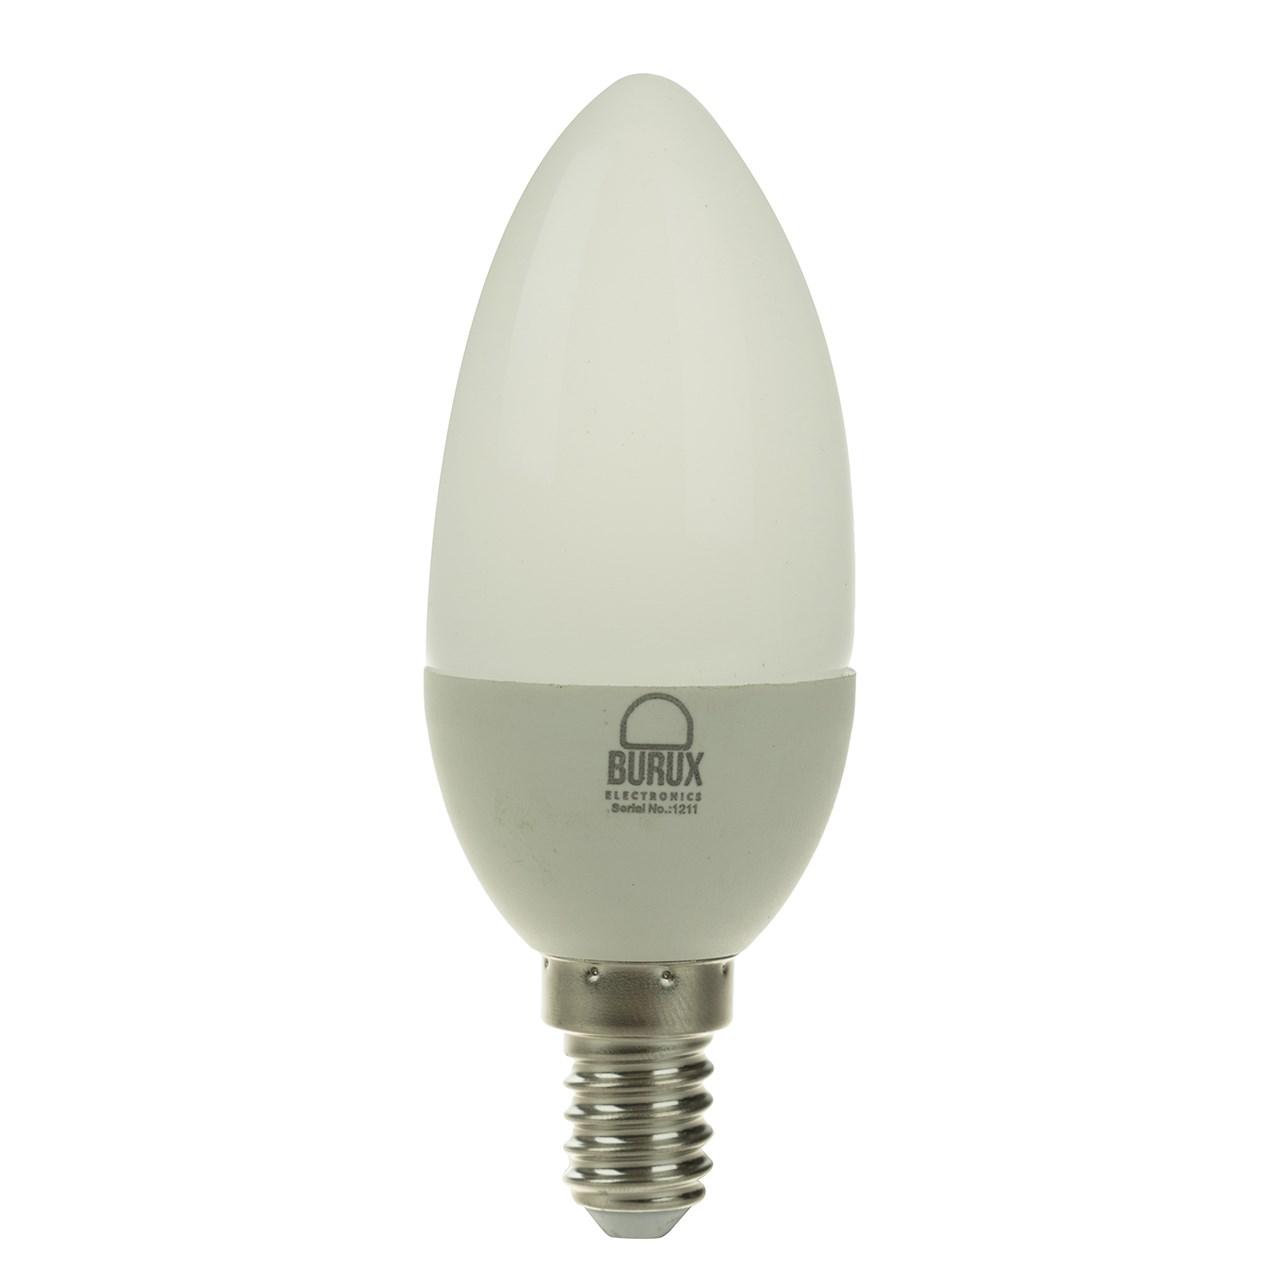 لامپ شمعی ال ای دی 3 وات بروکس مدل BRX003C30E1A4XX-PARC پایه E14